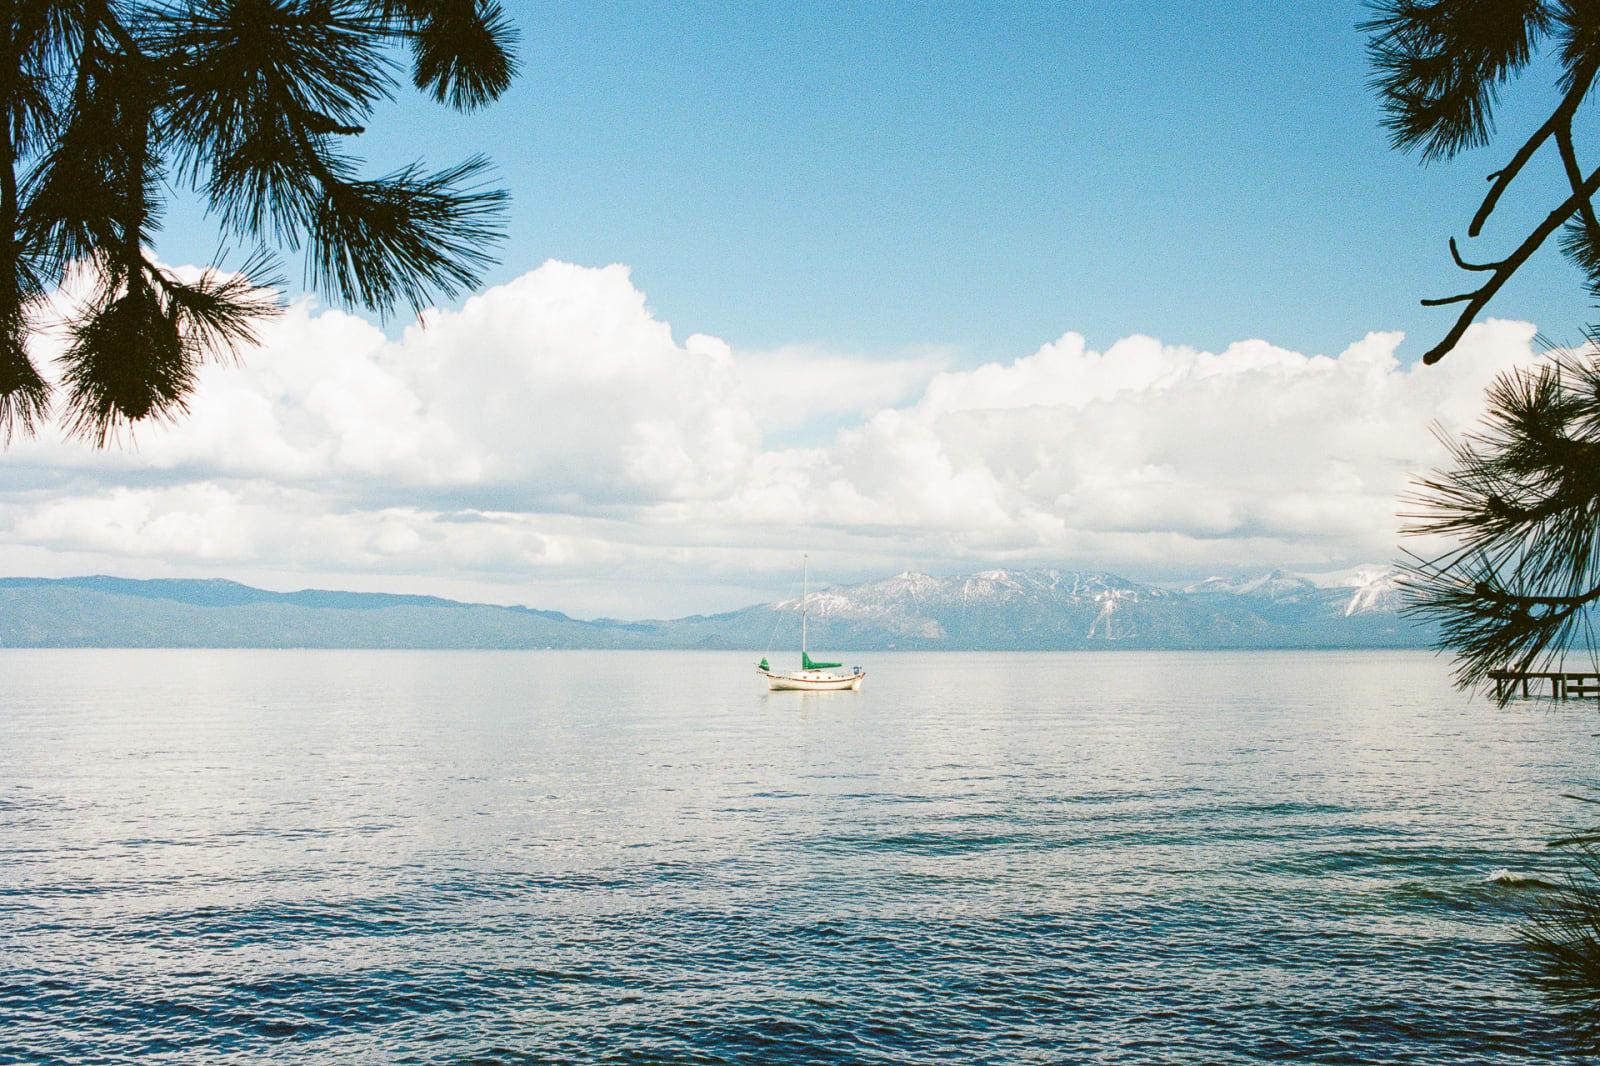 Boat on Lake Tahoe. Photo taken before thunderstorm. Summer, 2019.